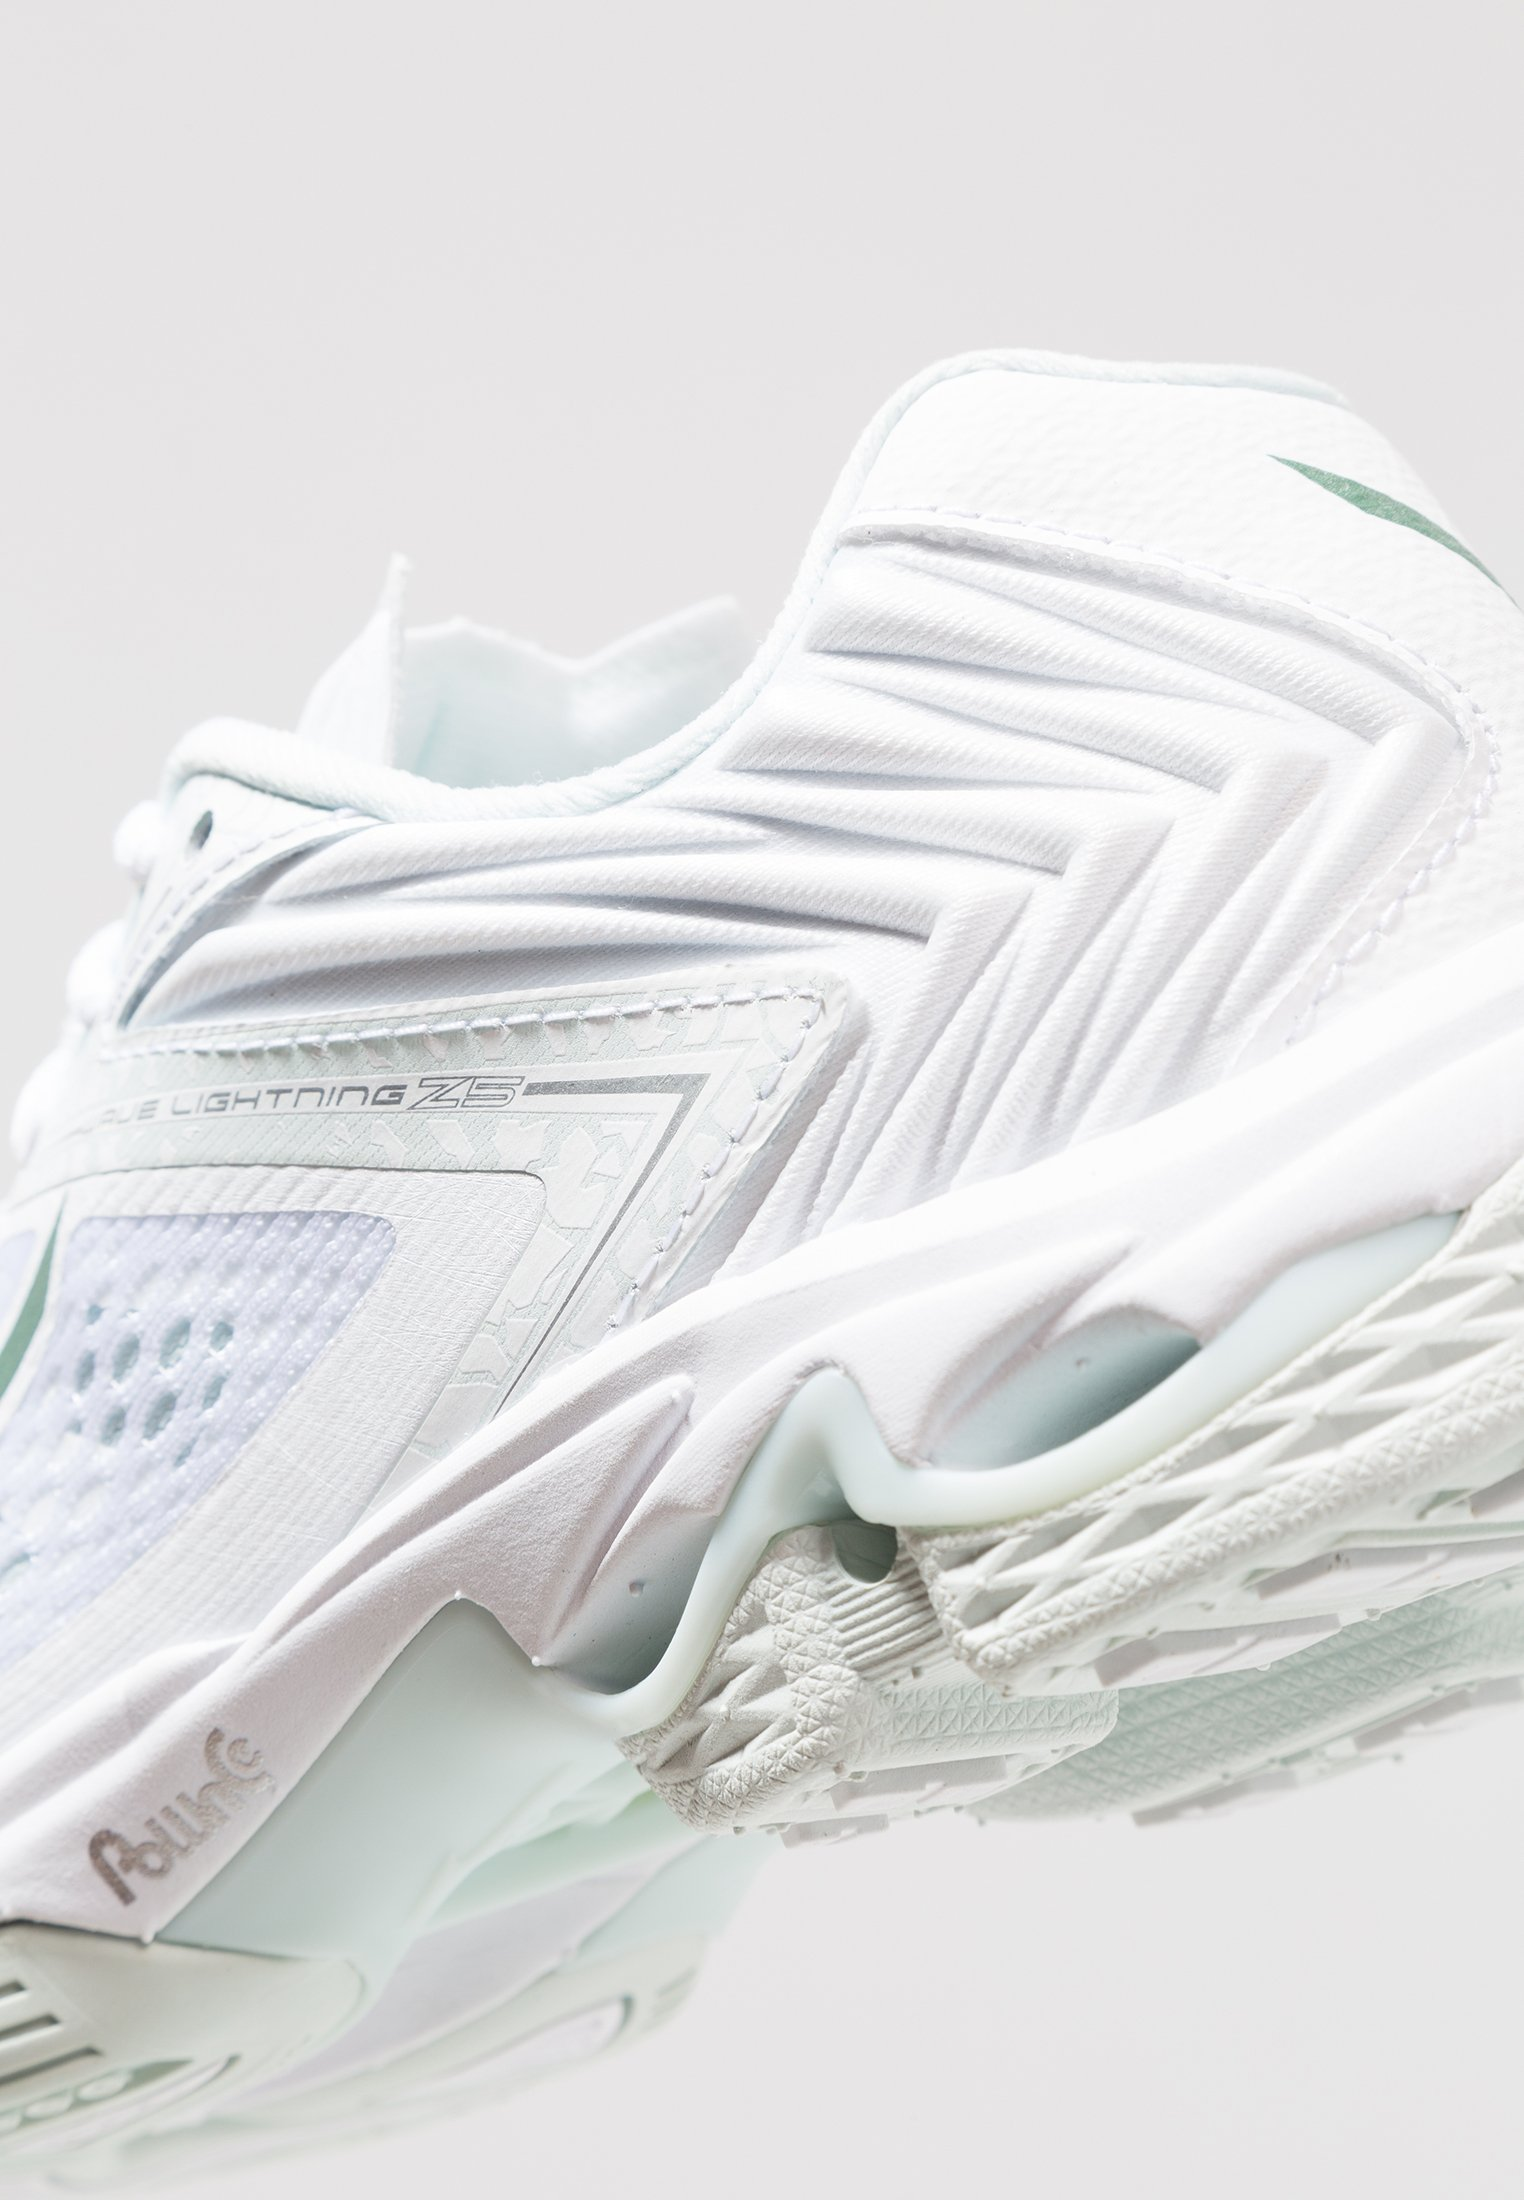 mizuno volleyball shoes wave lightning z5 uk 10